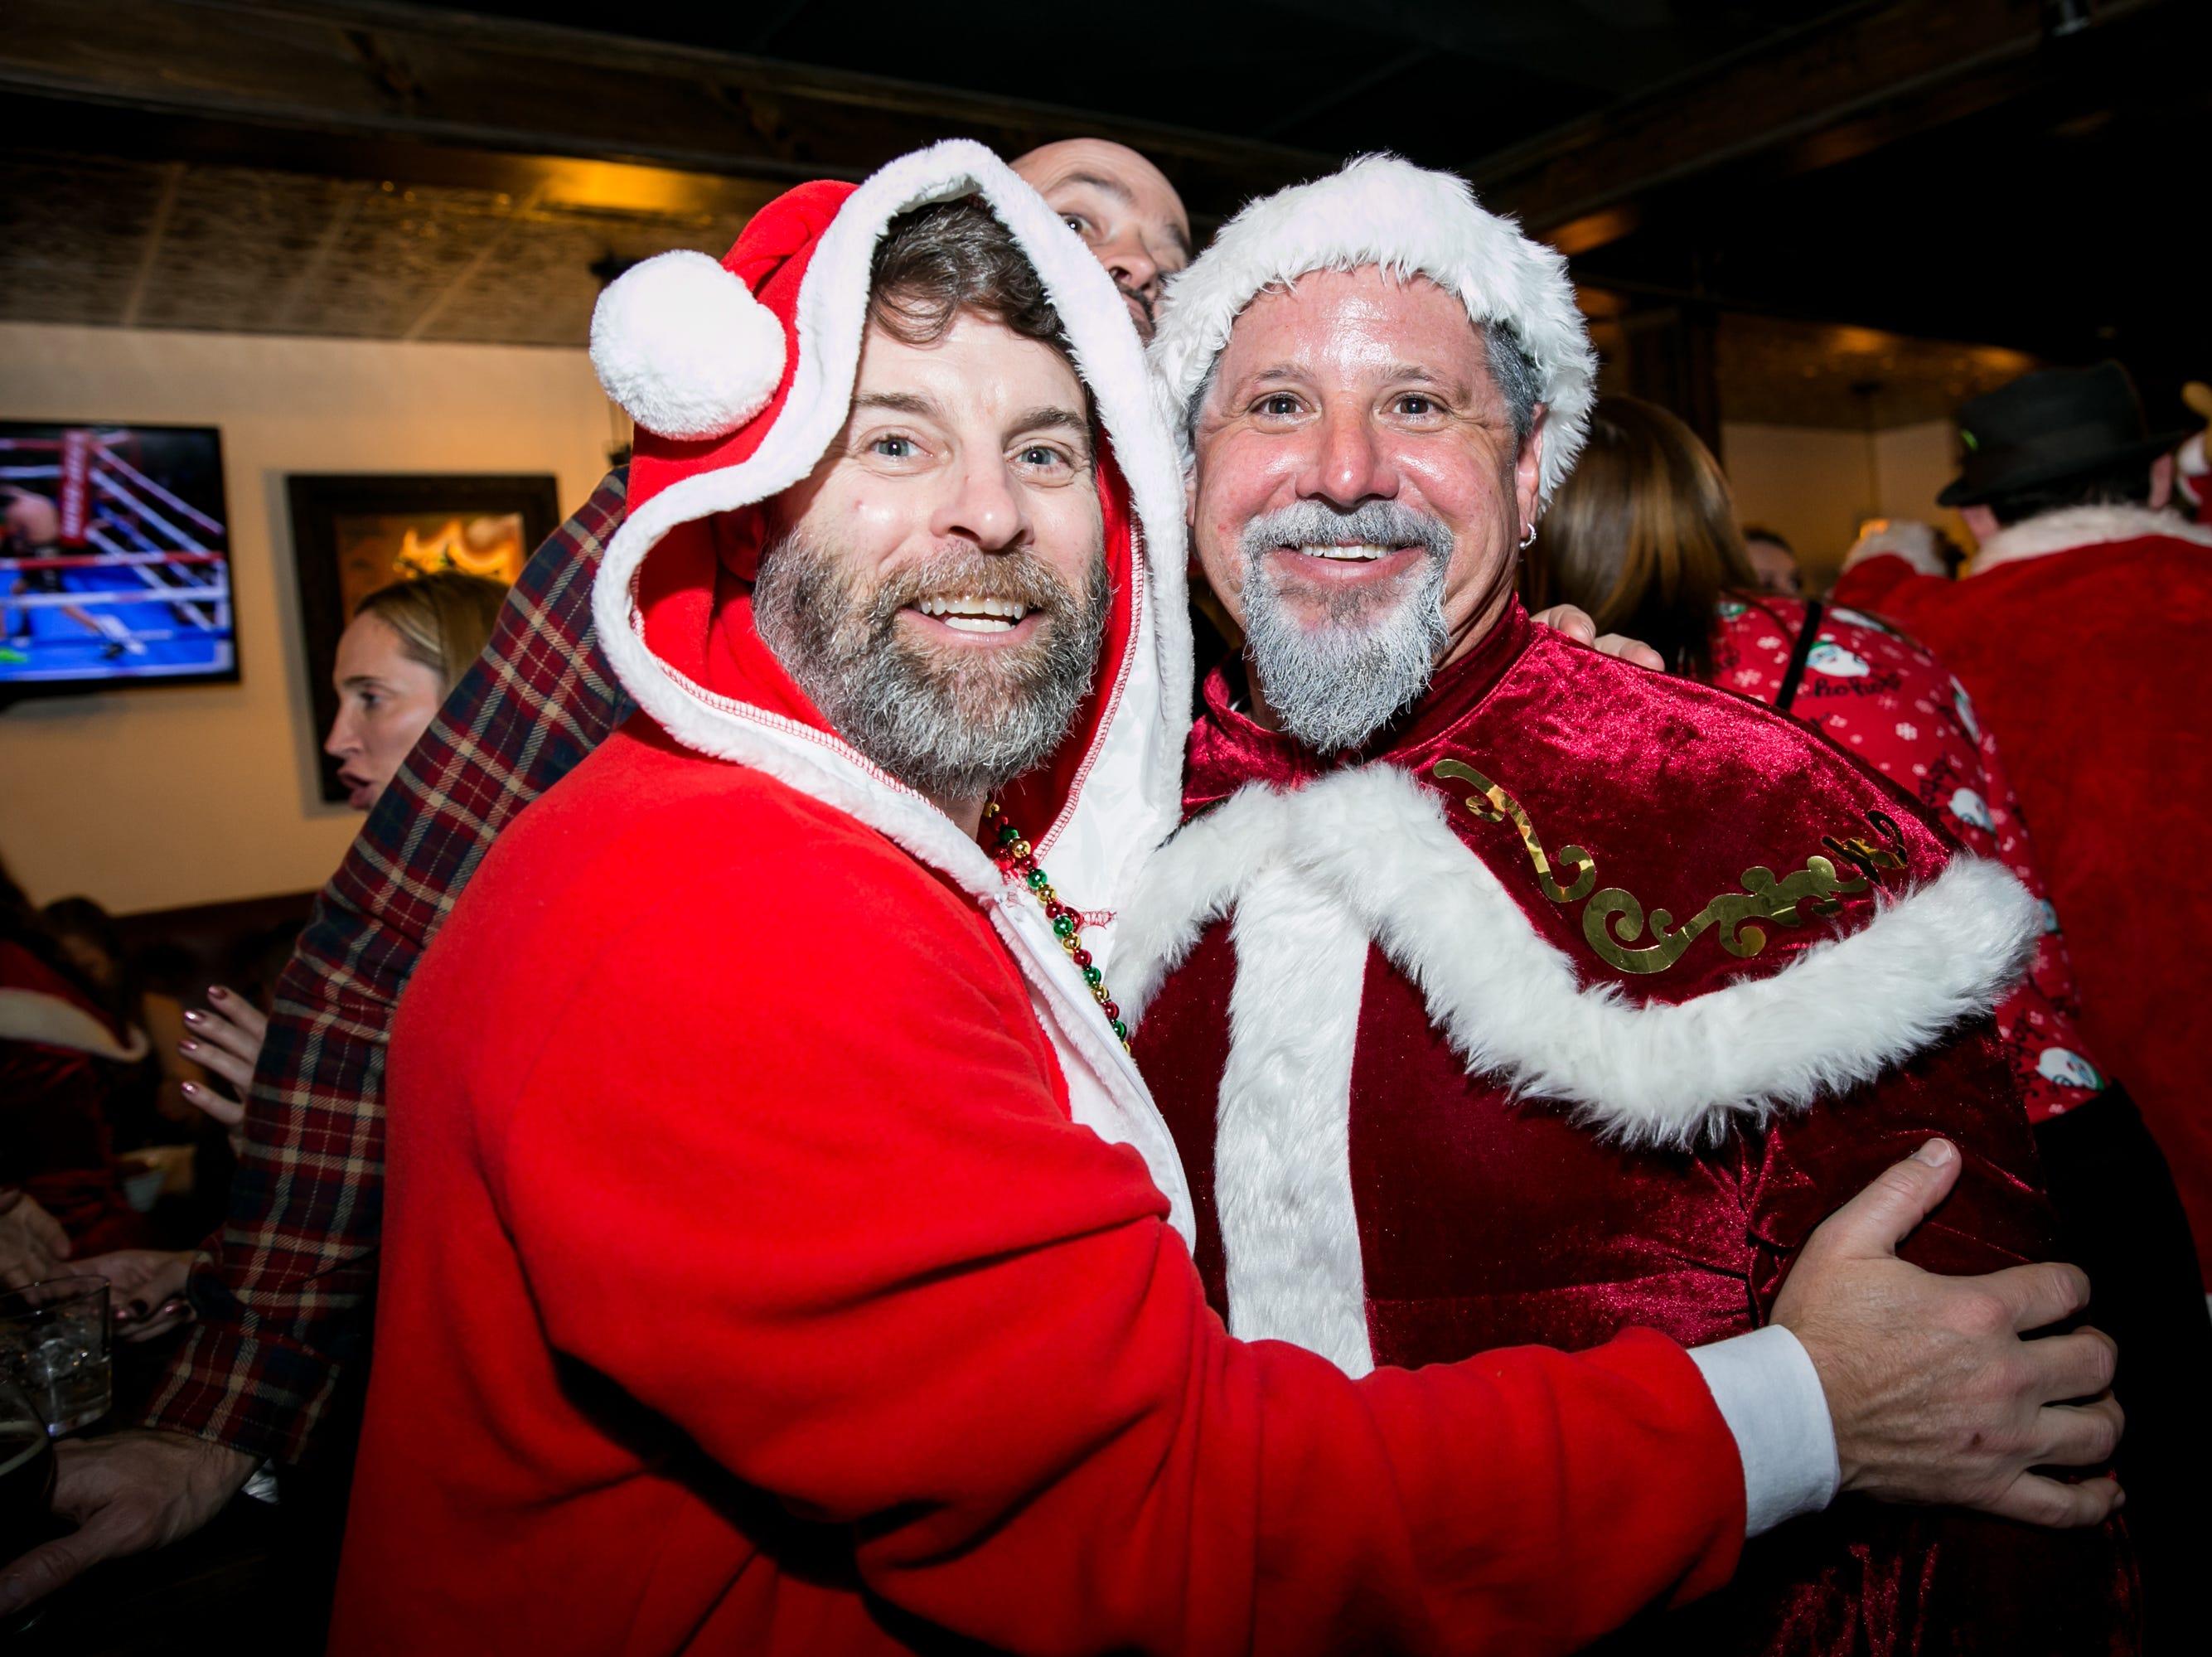 These Santas felt jolly during Santarchy on Saturday, December 8, 2018.